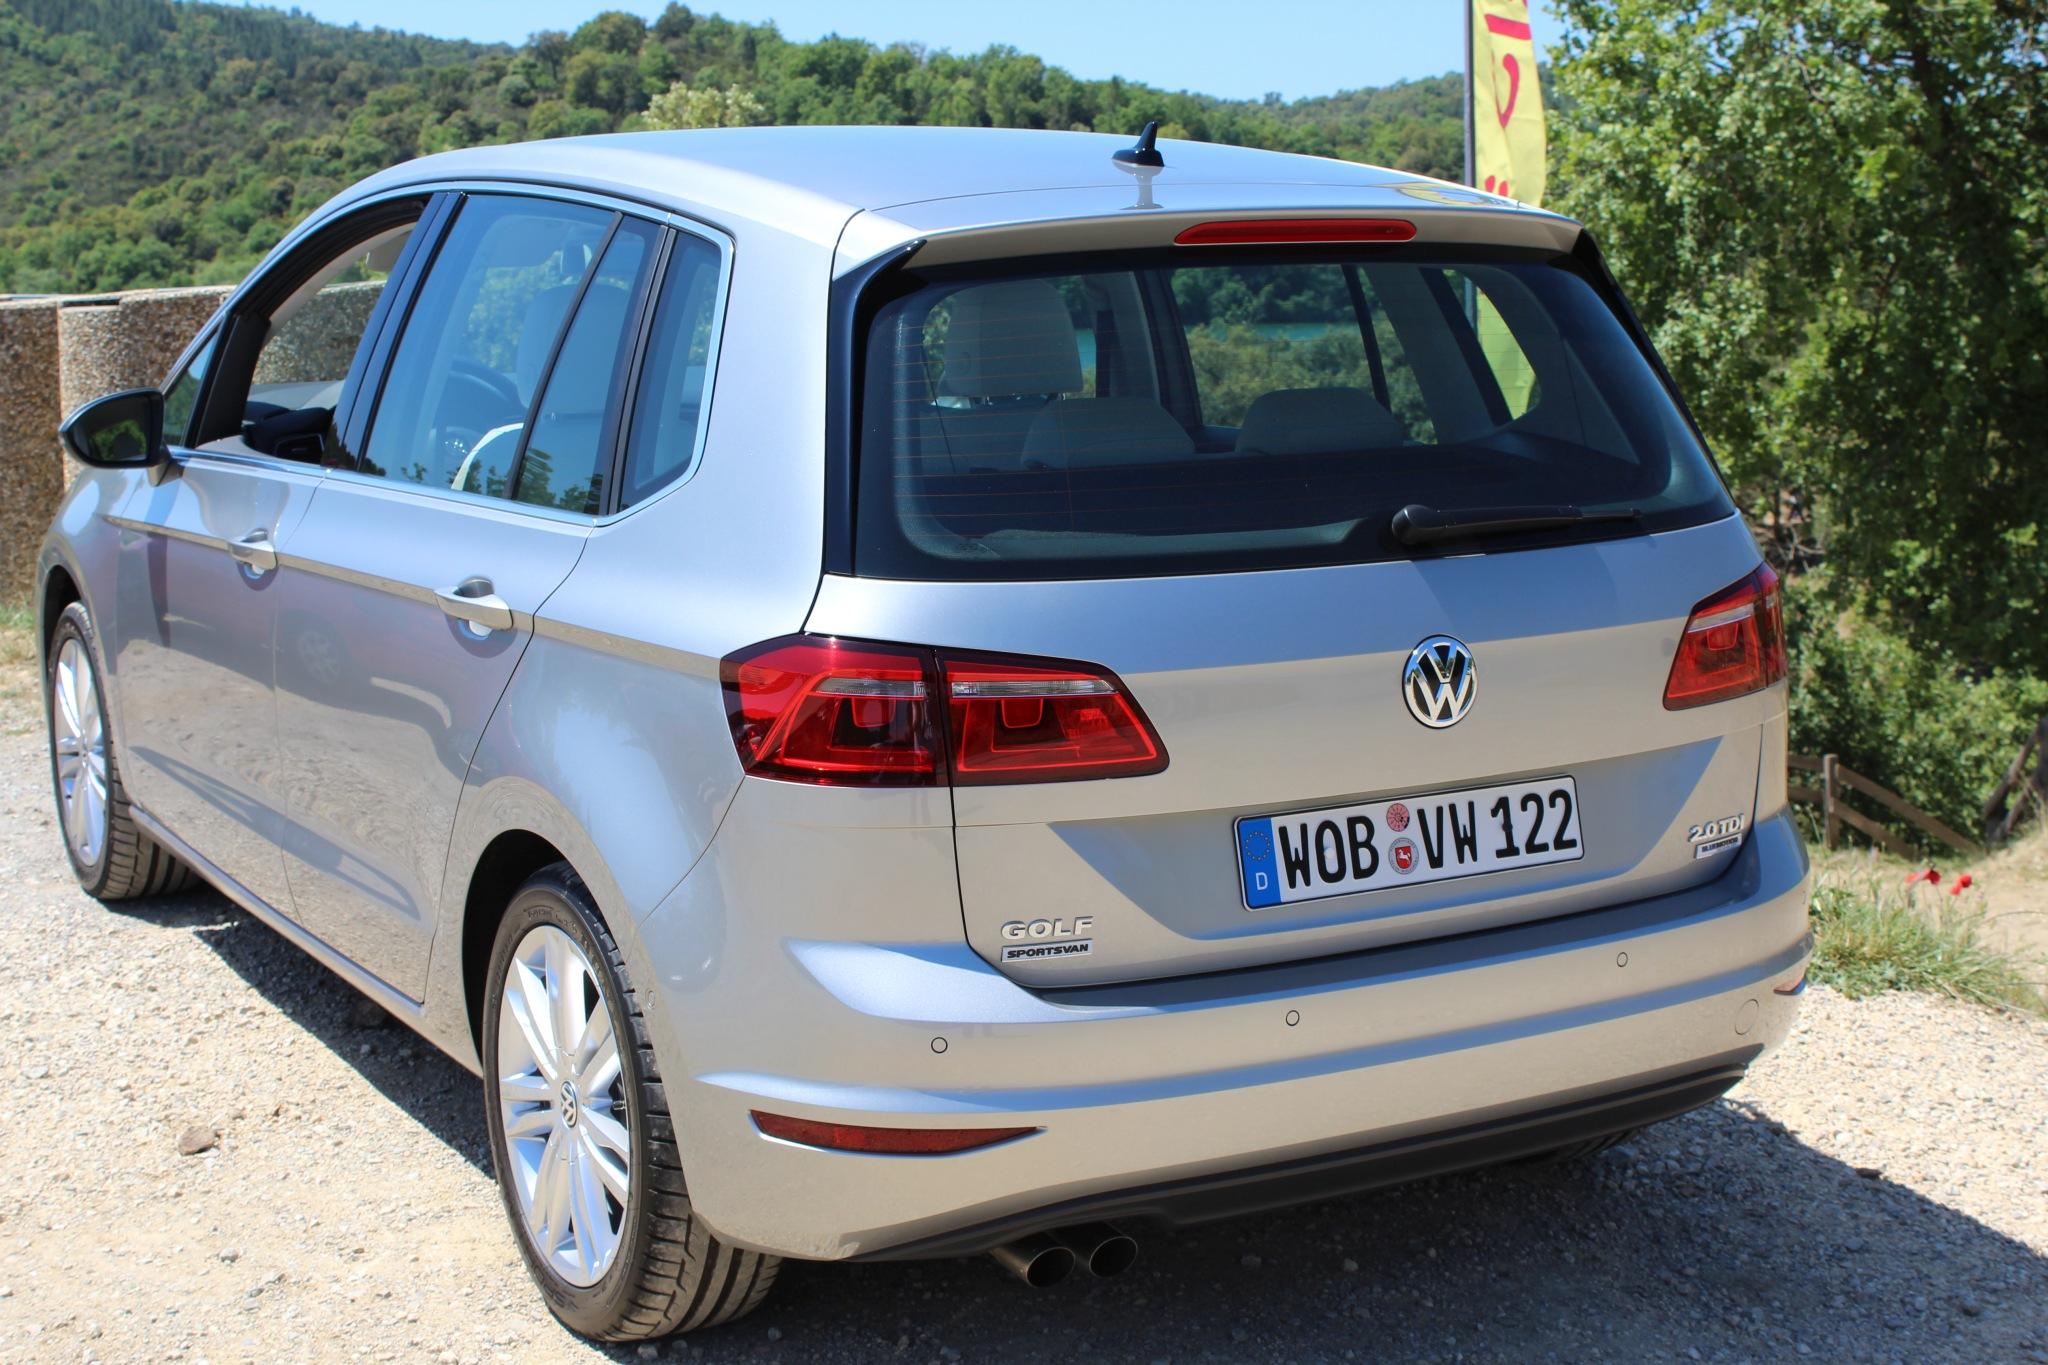 File:VW Golf Sportsvan (14214834855).jpg - Wikimedia Commons